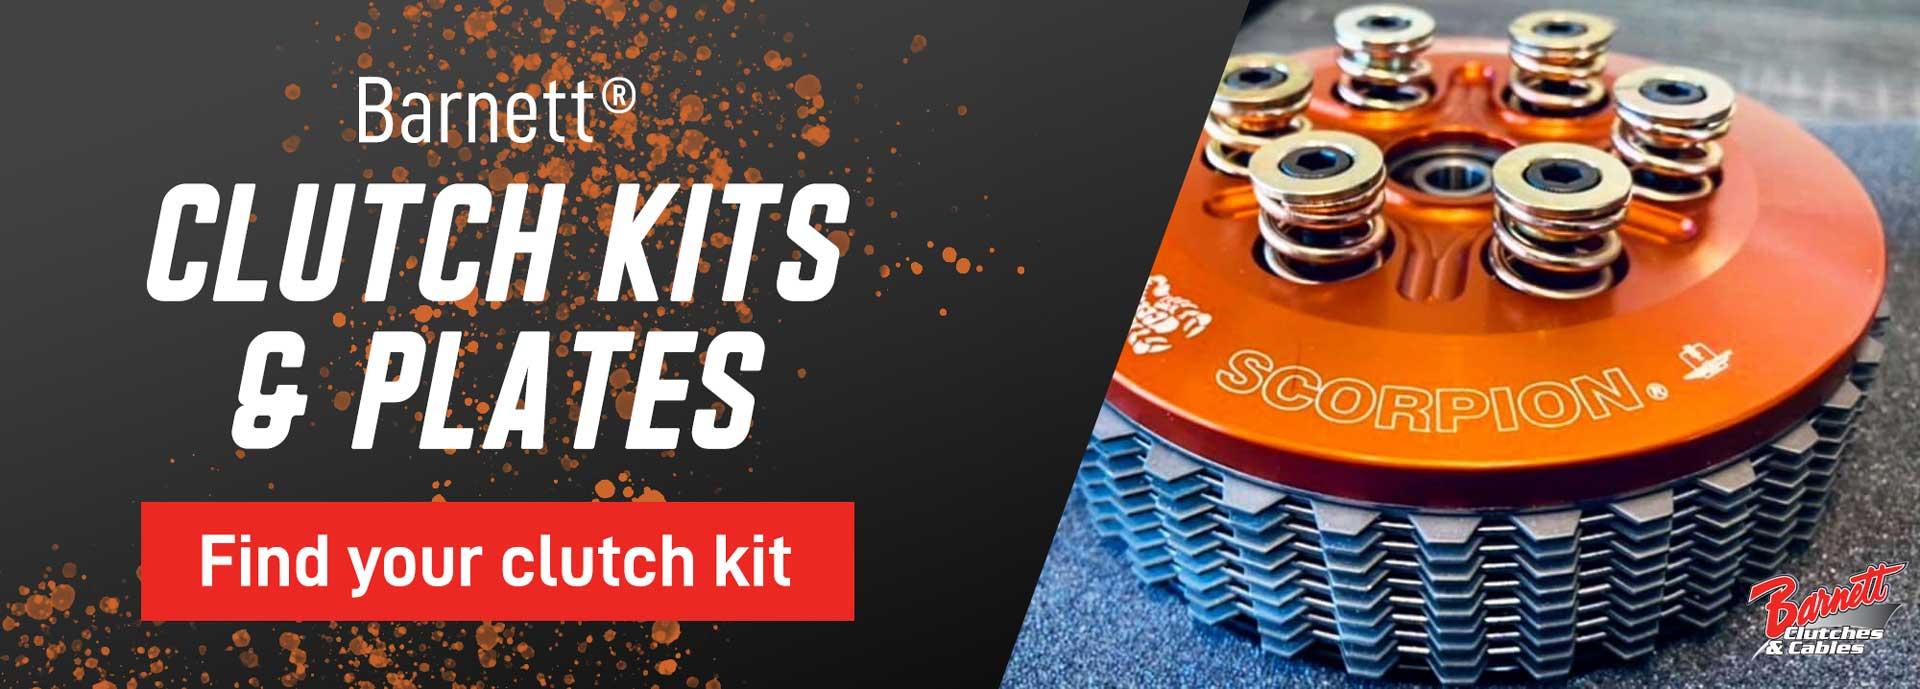 billet-proof-ad-barnett-clutch-kits-3.jpg